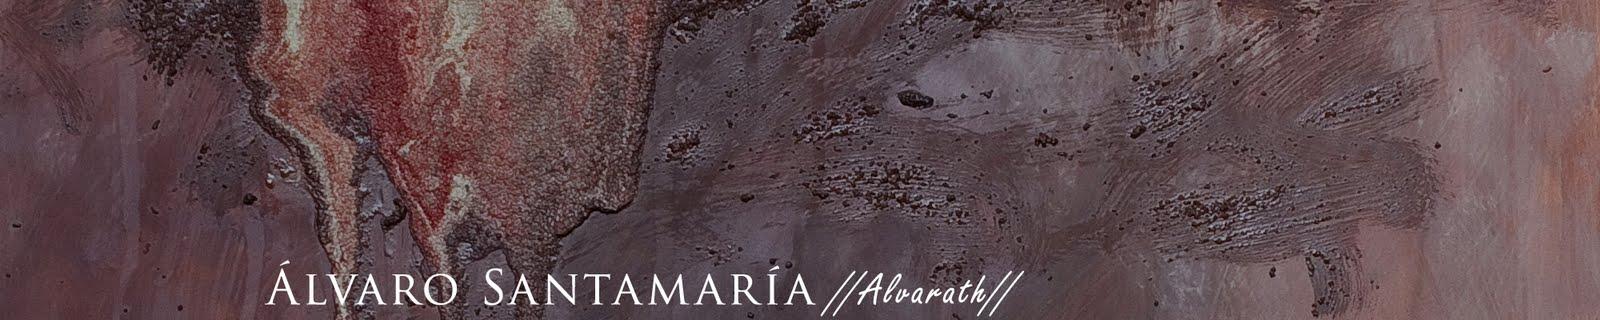 Álvaro Santamaría //Alvarath//